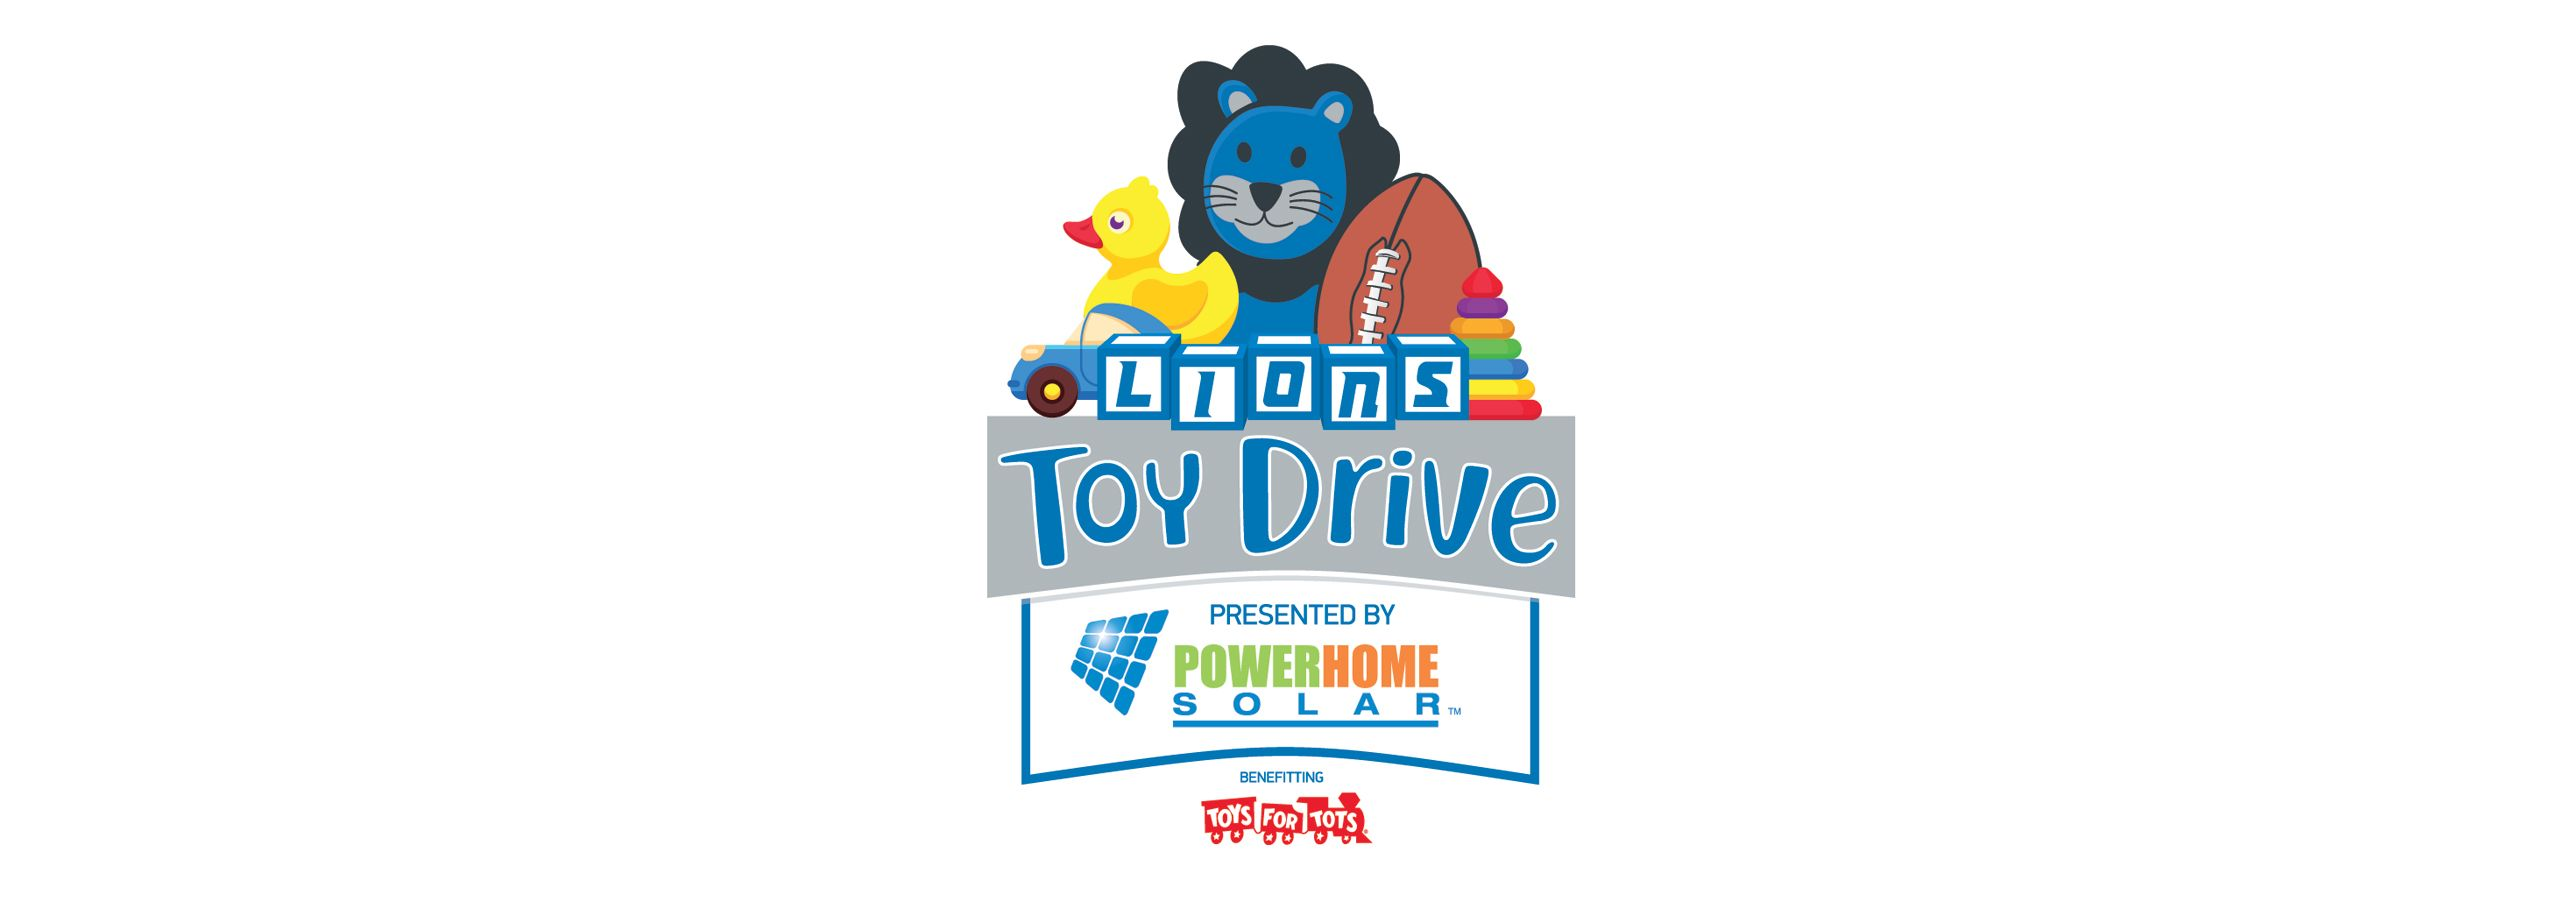 toy-drive-header